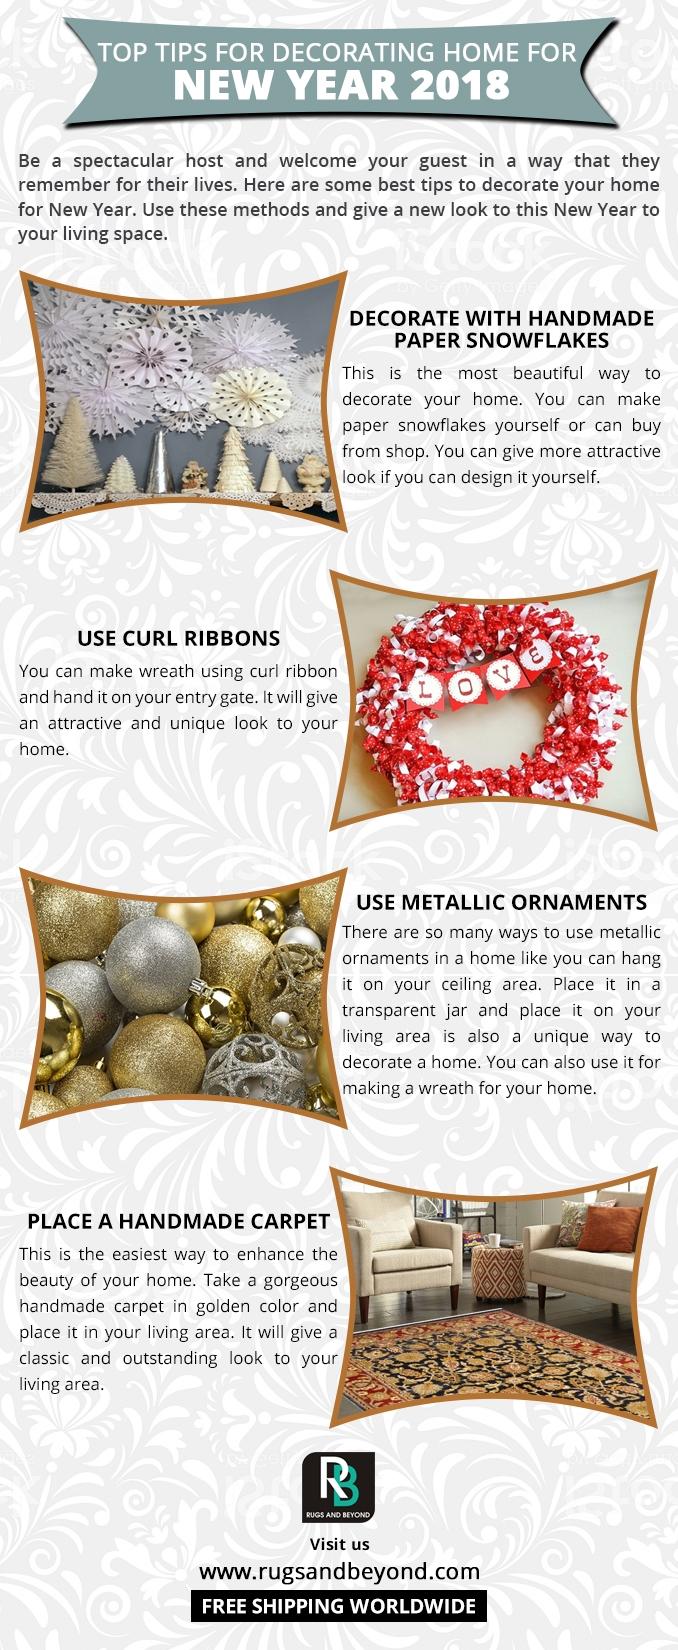 Decorative ideas, Home improvement ideas, handmade carpet, coffee mug